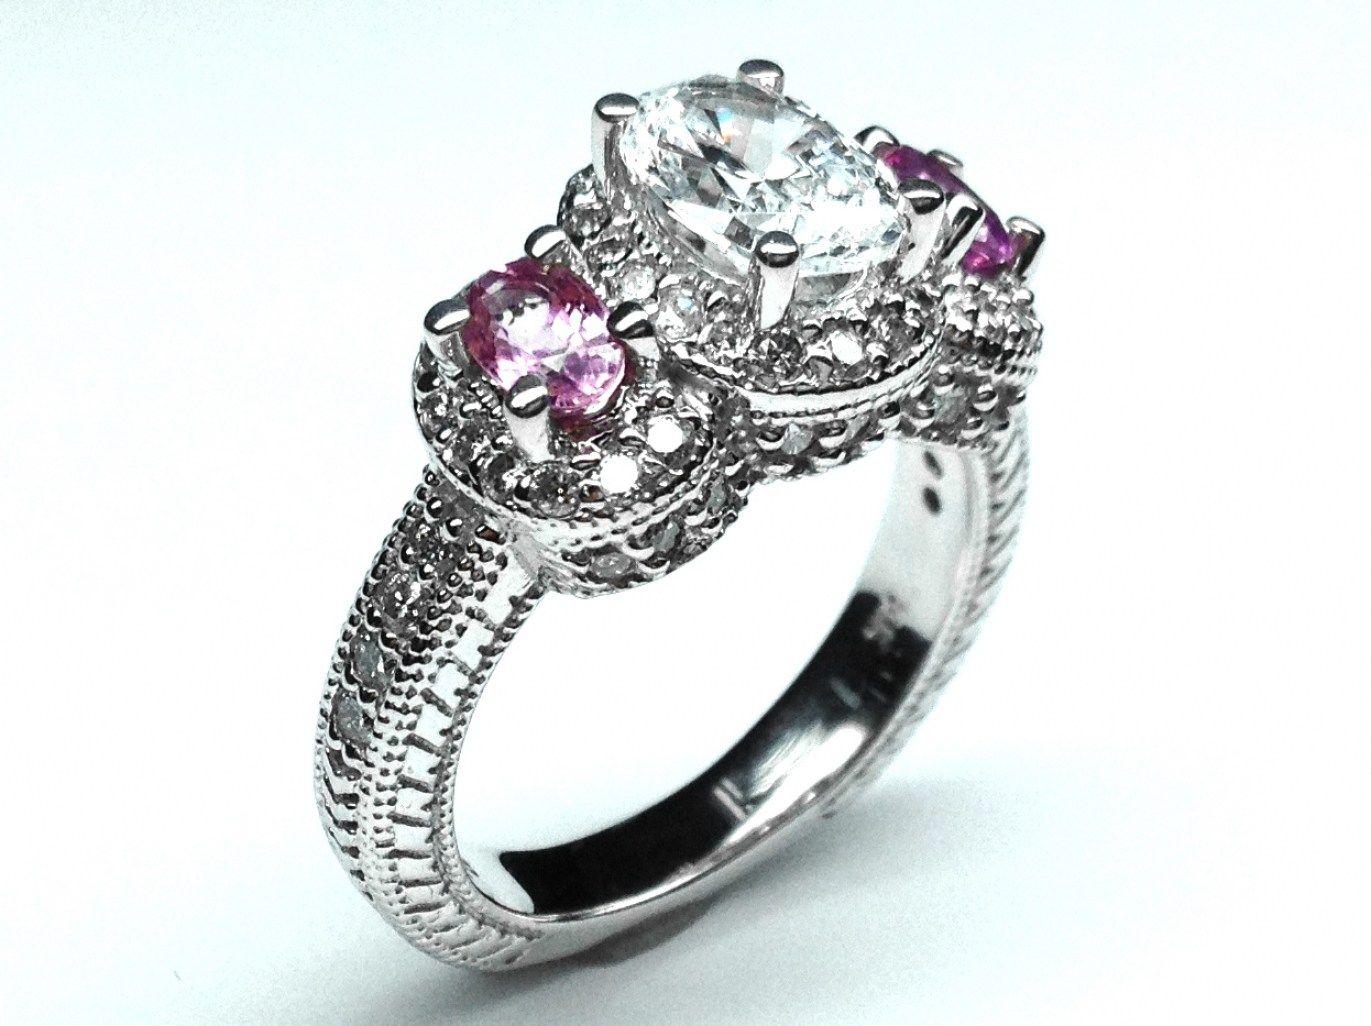 31 Amazing Wedding Rings With Colored Stones | Weddings and Wedding